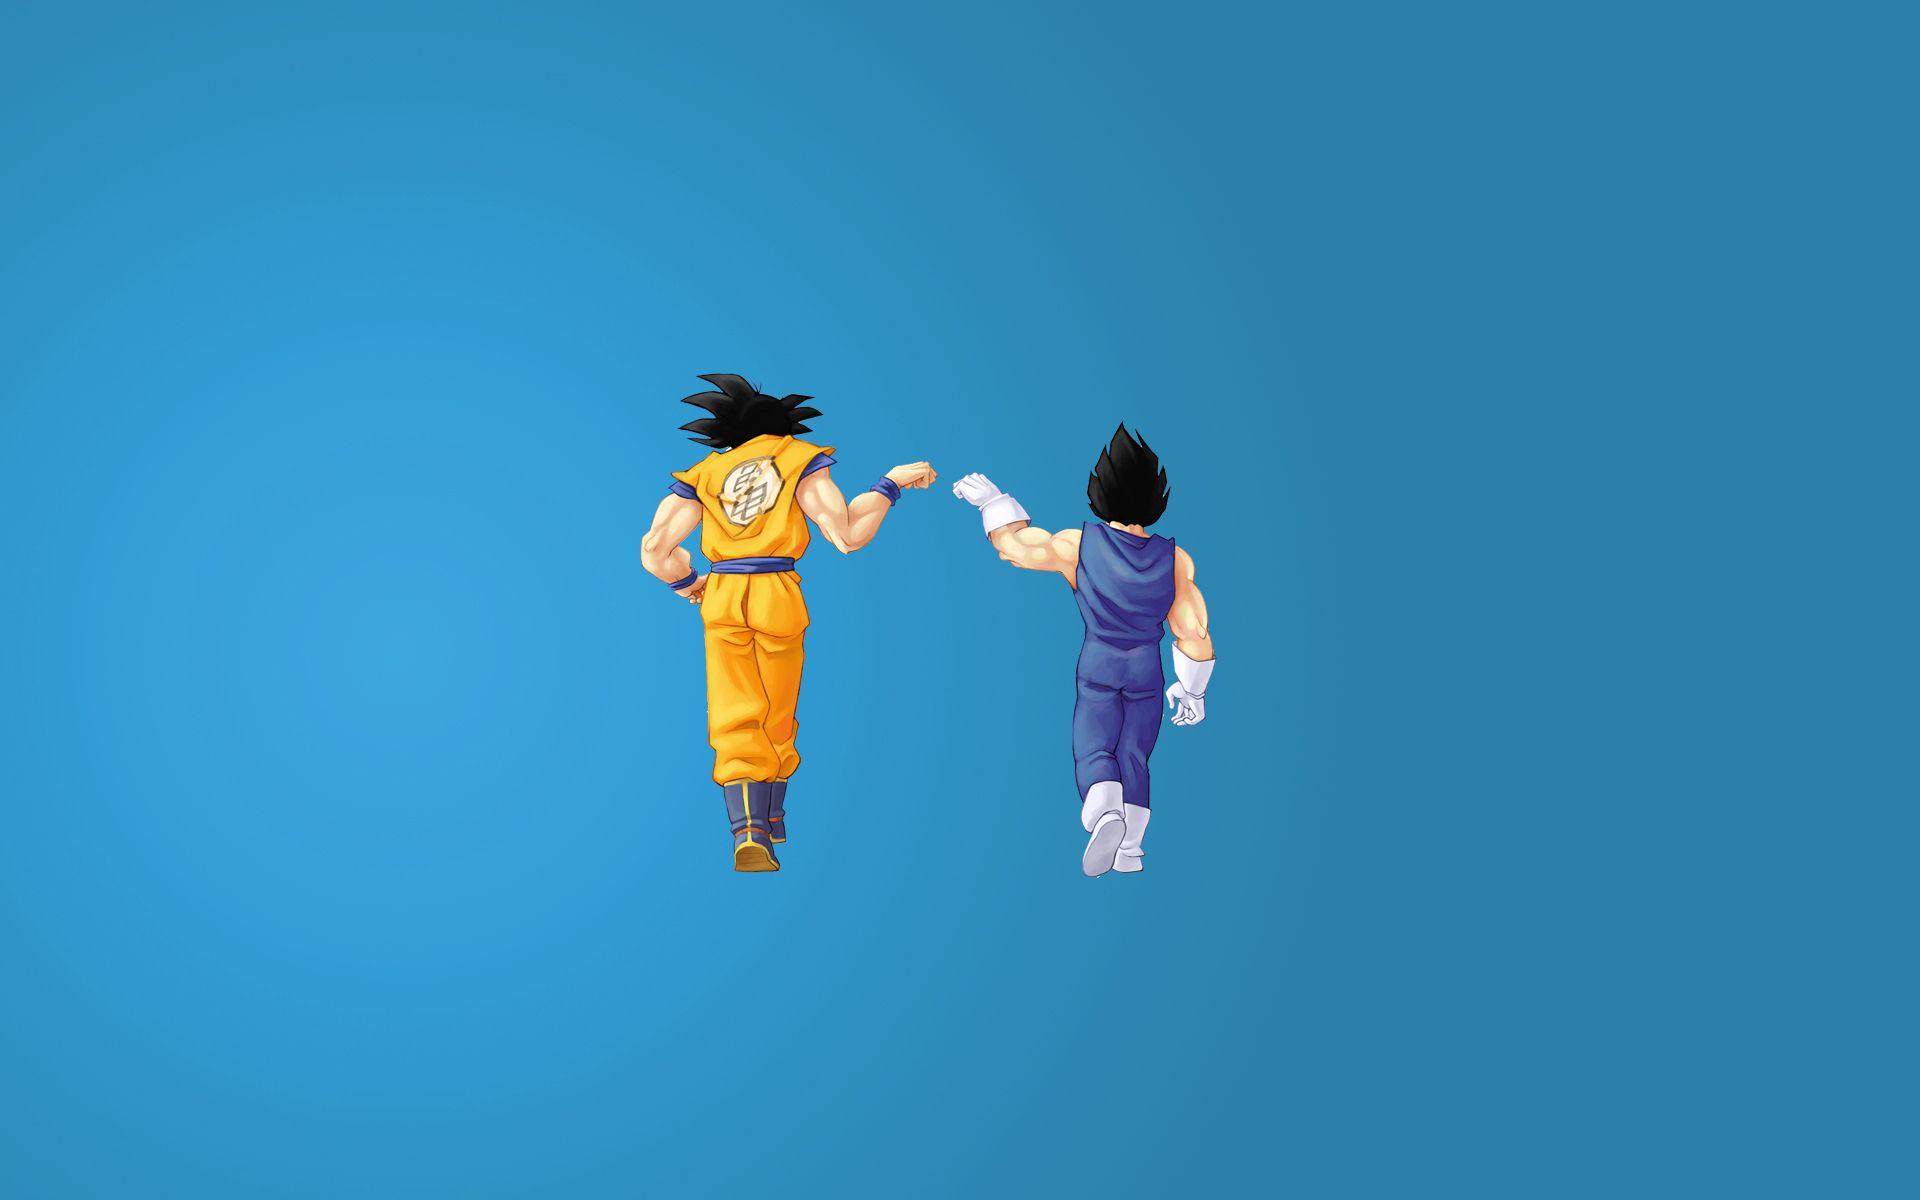 Dragon Ball Z Wallpapers Goku Wallpaper 1920x1200